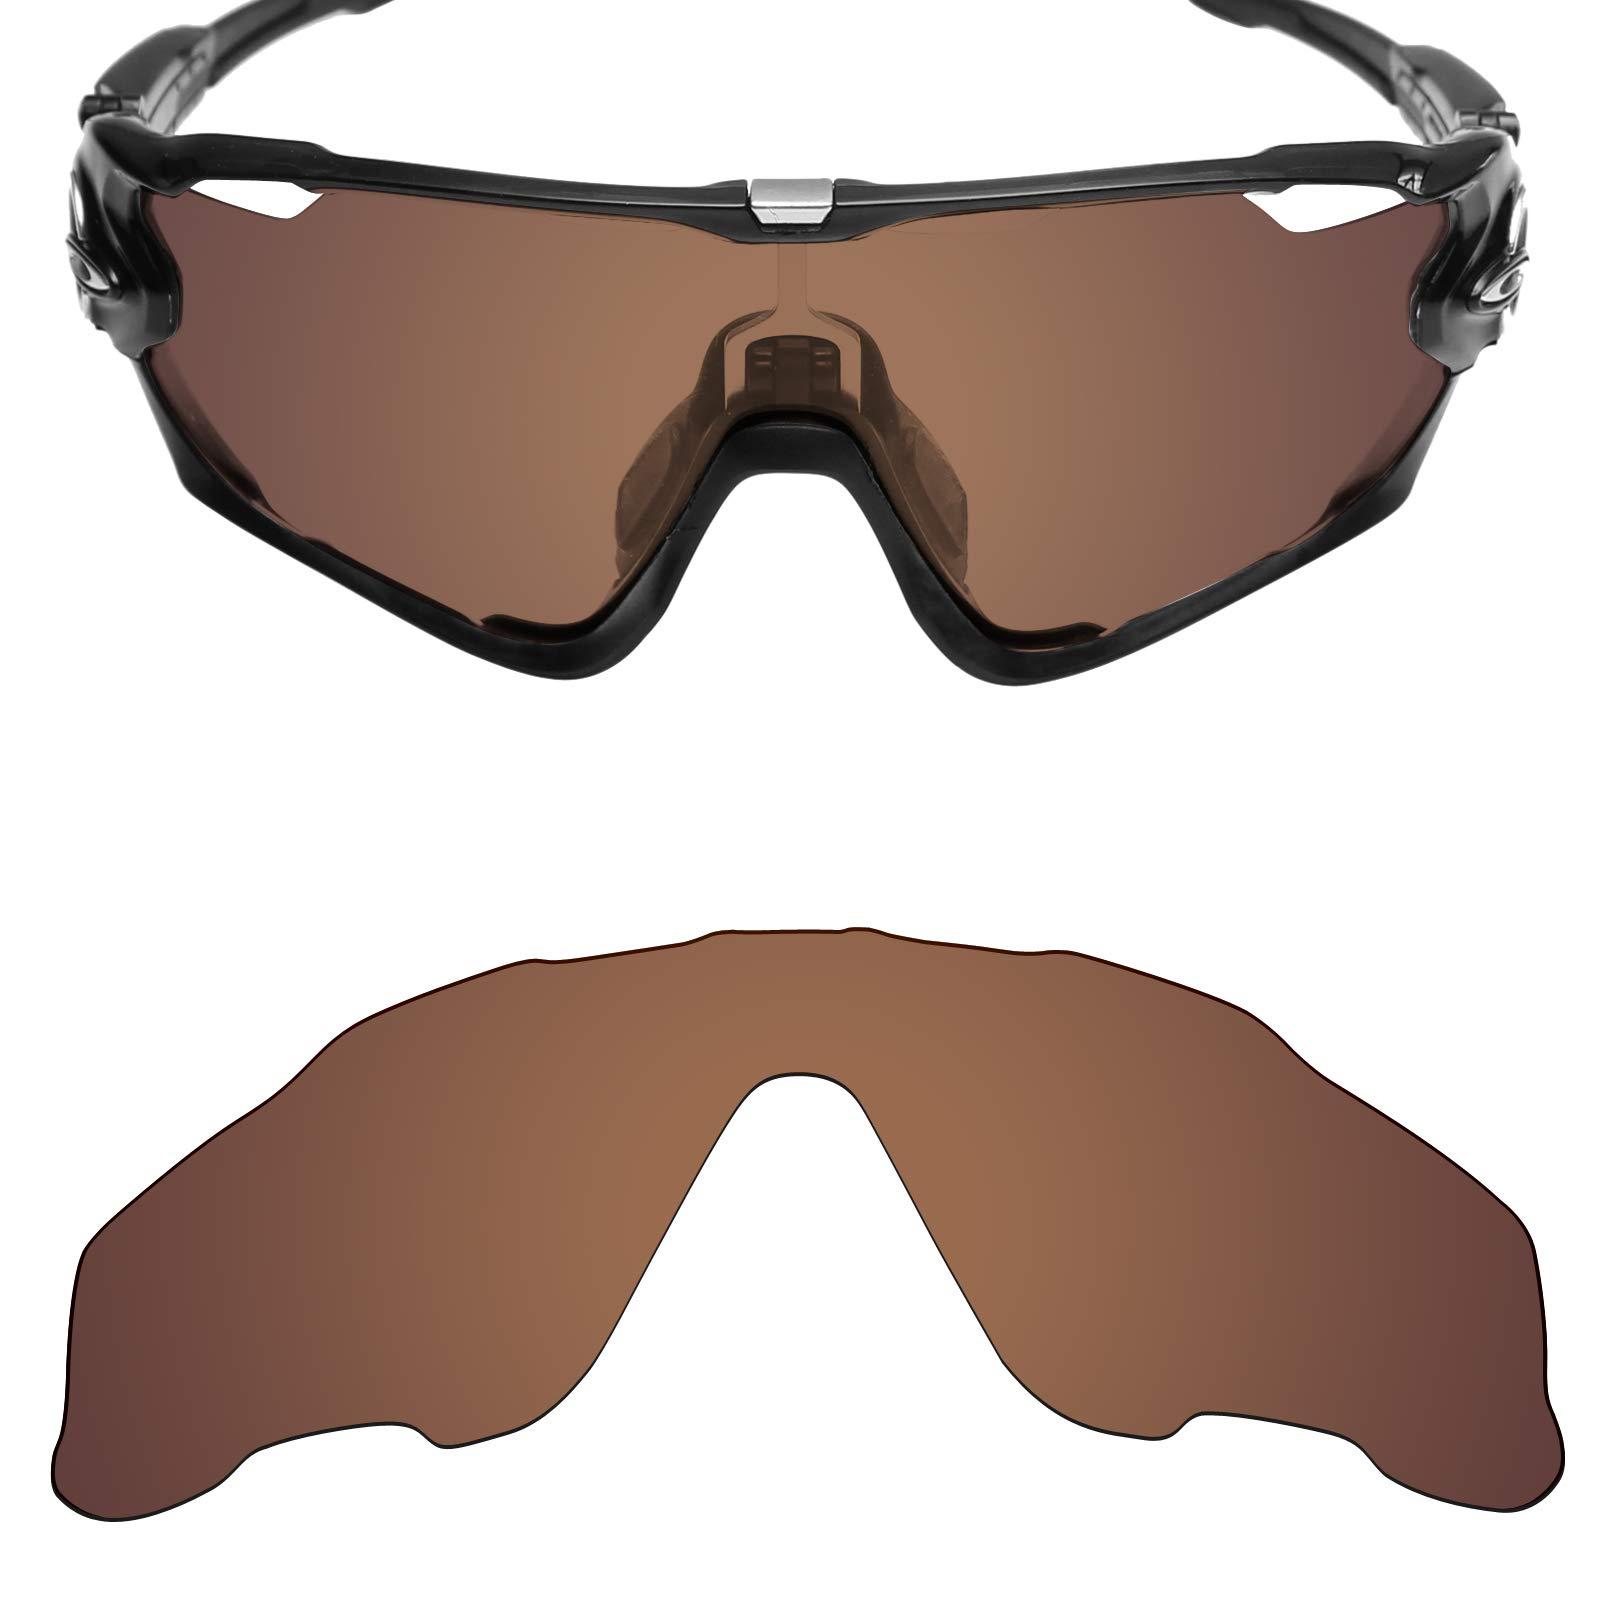 Mryok UV400 Replacement Lenses for Oakley Jawbreaker - Bronze Brown e8a99f99b8